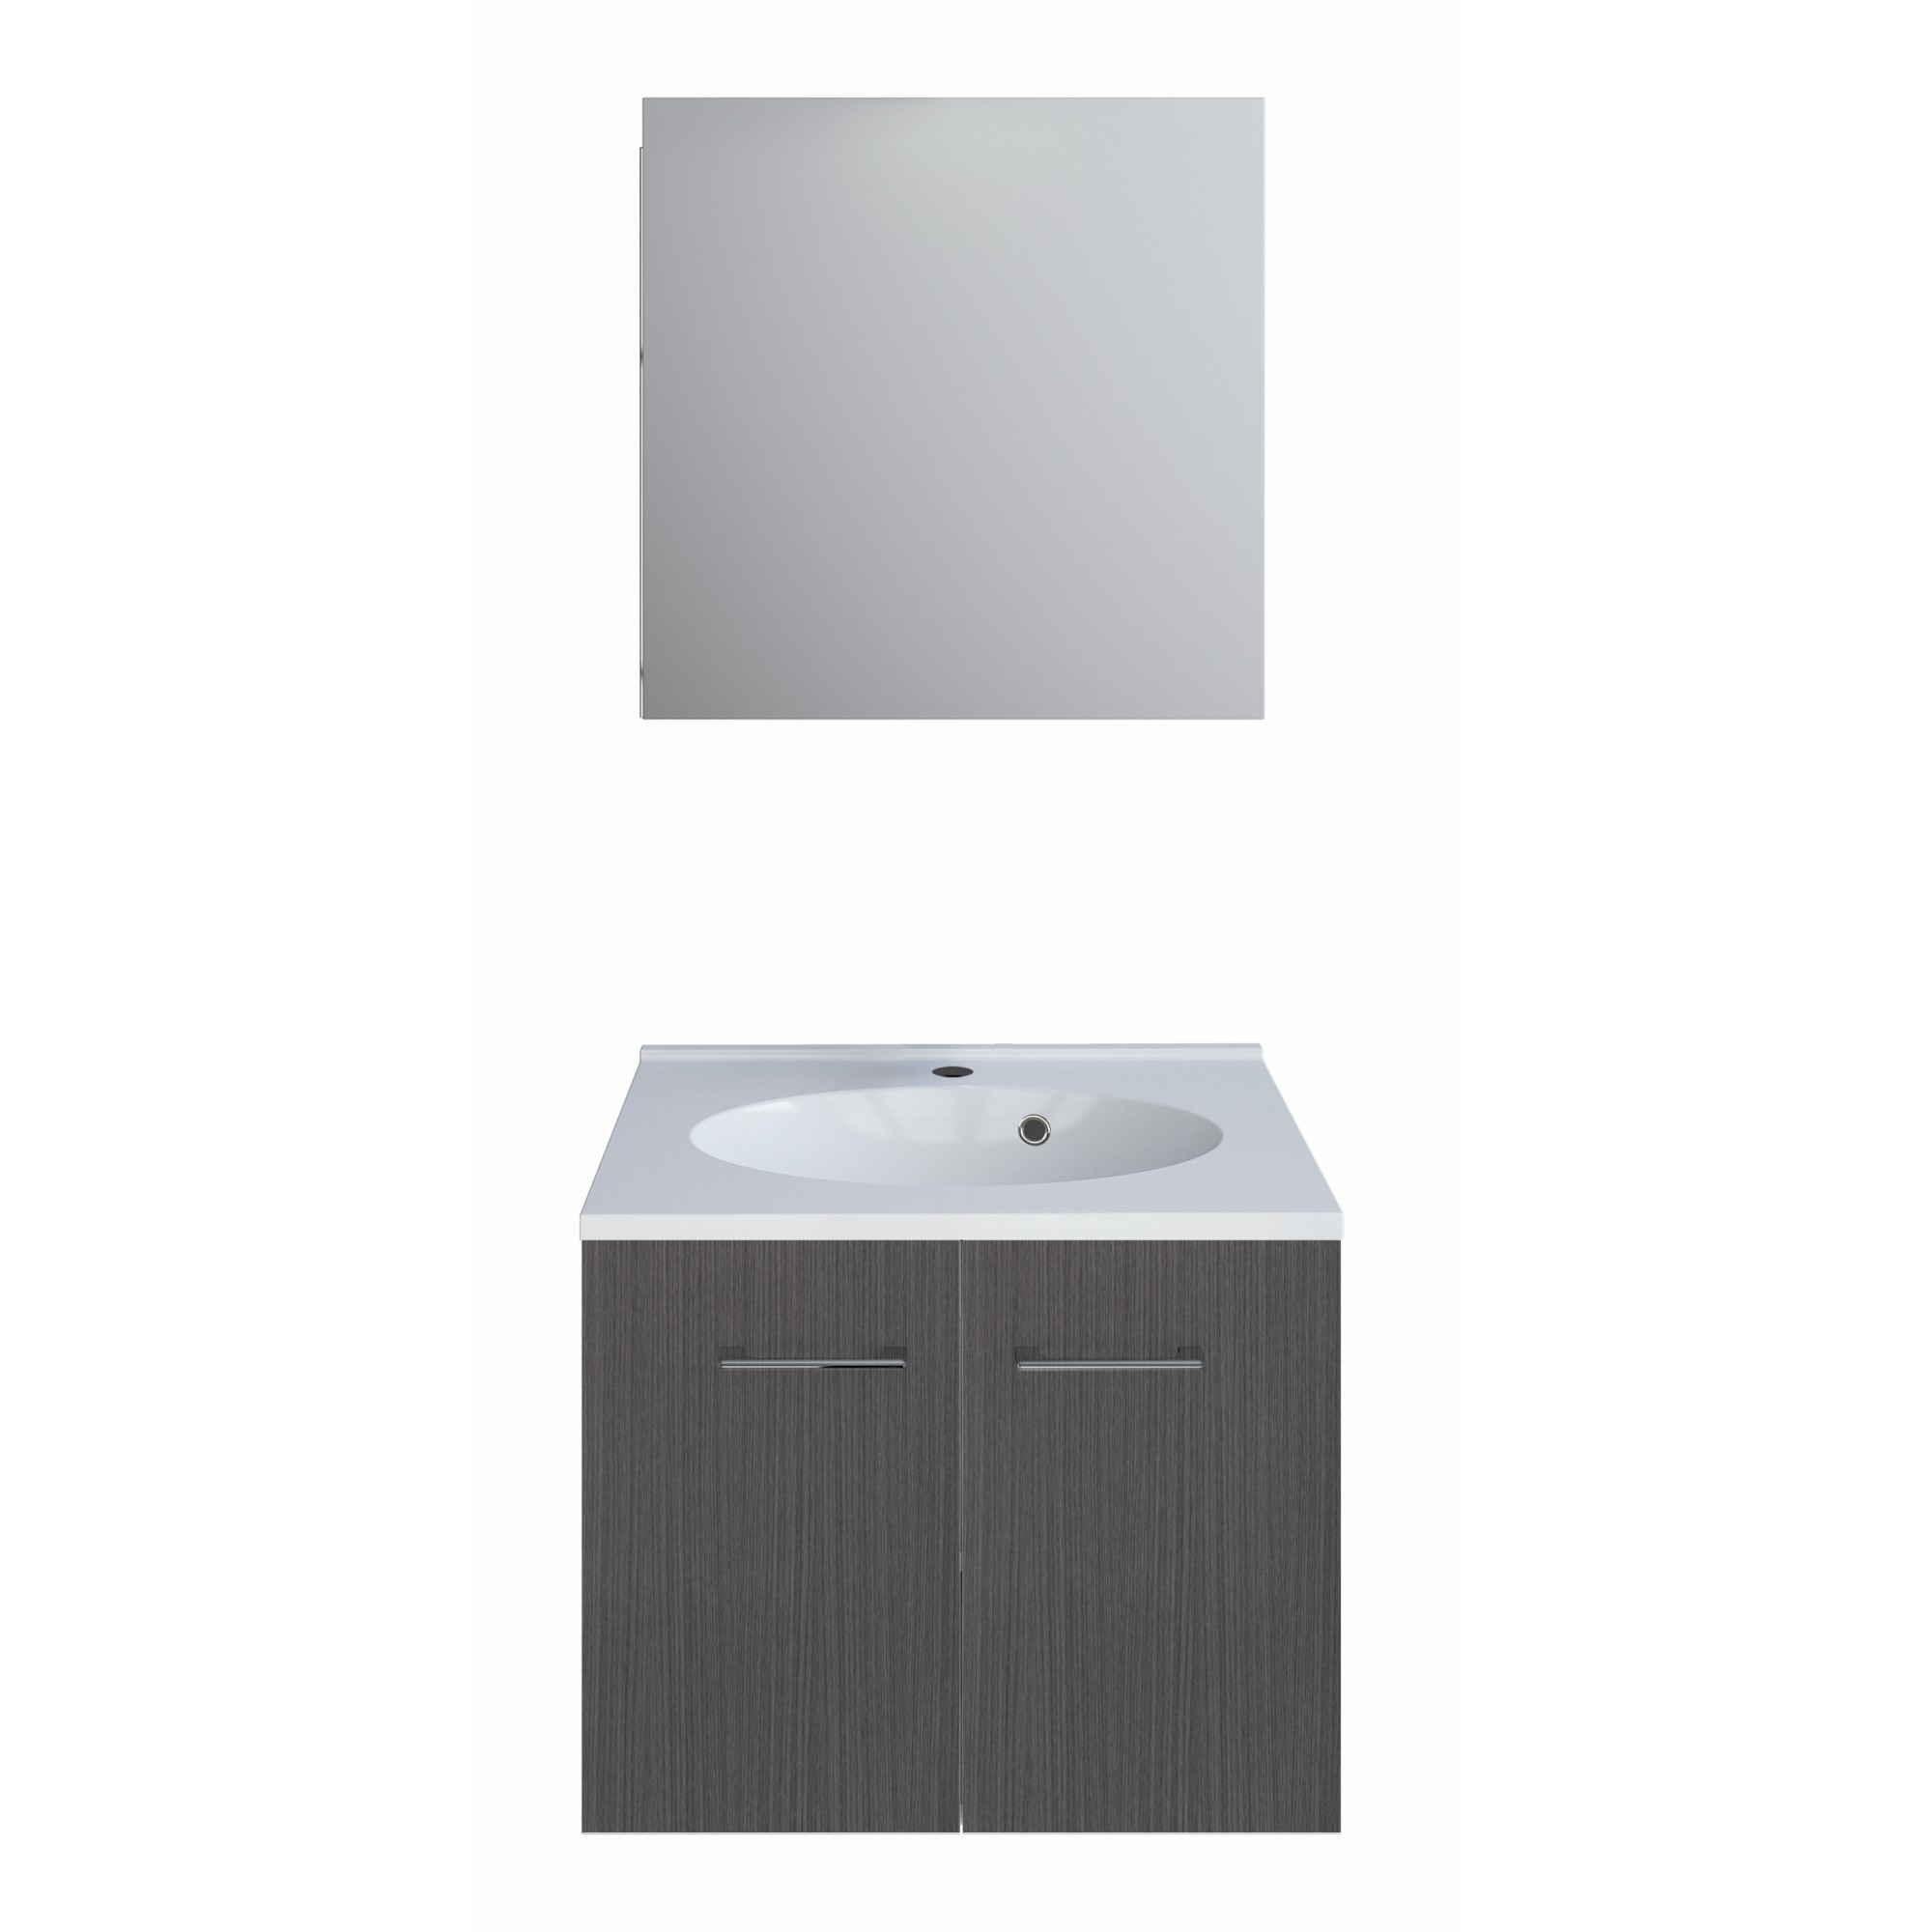 Allibert Bathroom Cabinets Allibert One Pack Badkamermeubel 60 Cm Grijs Eiken